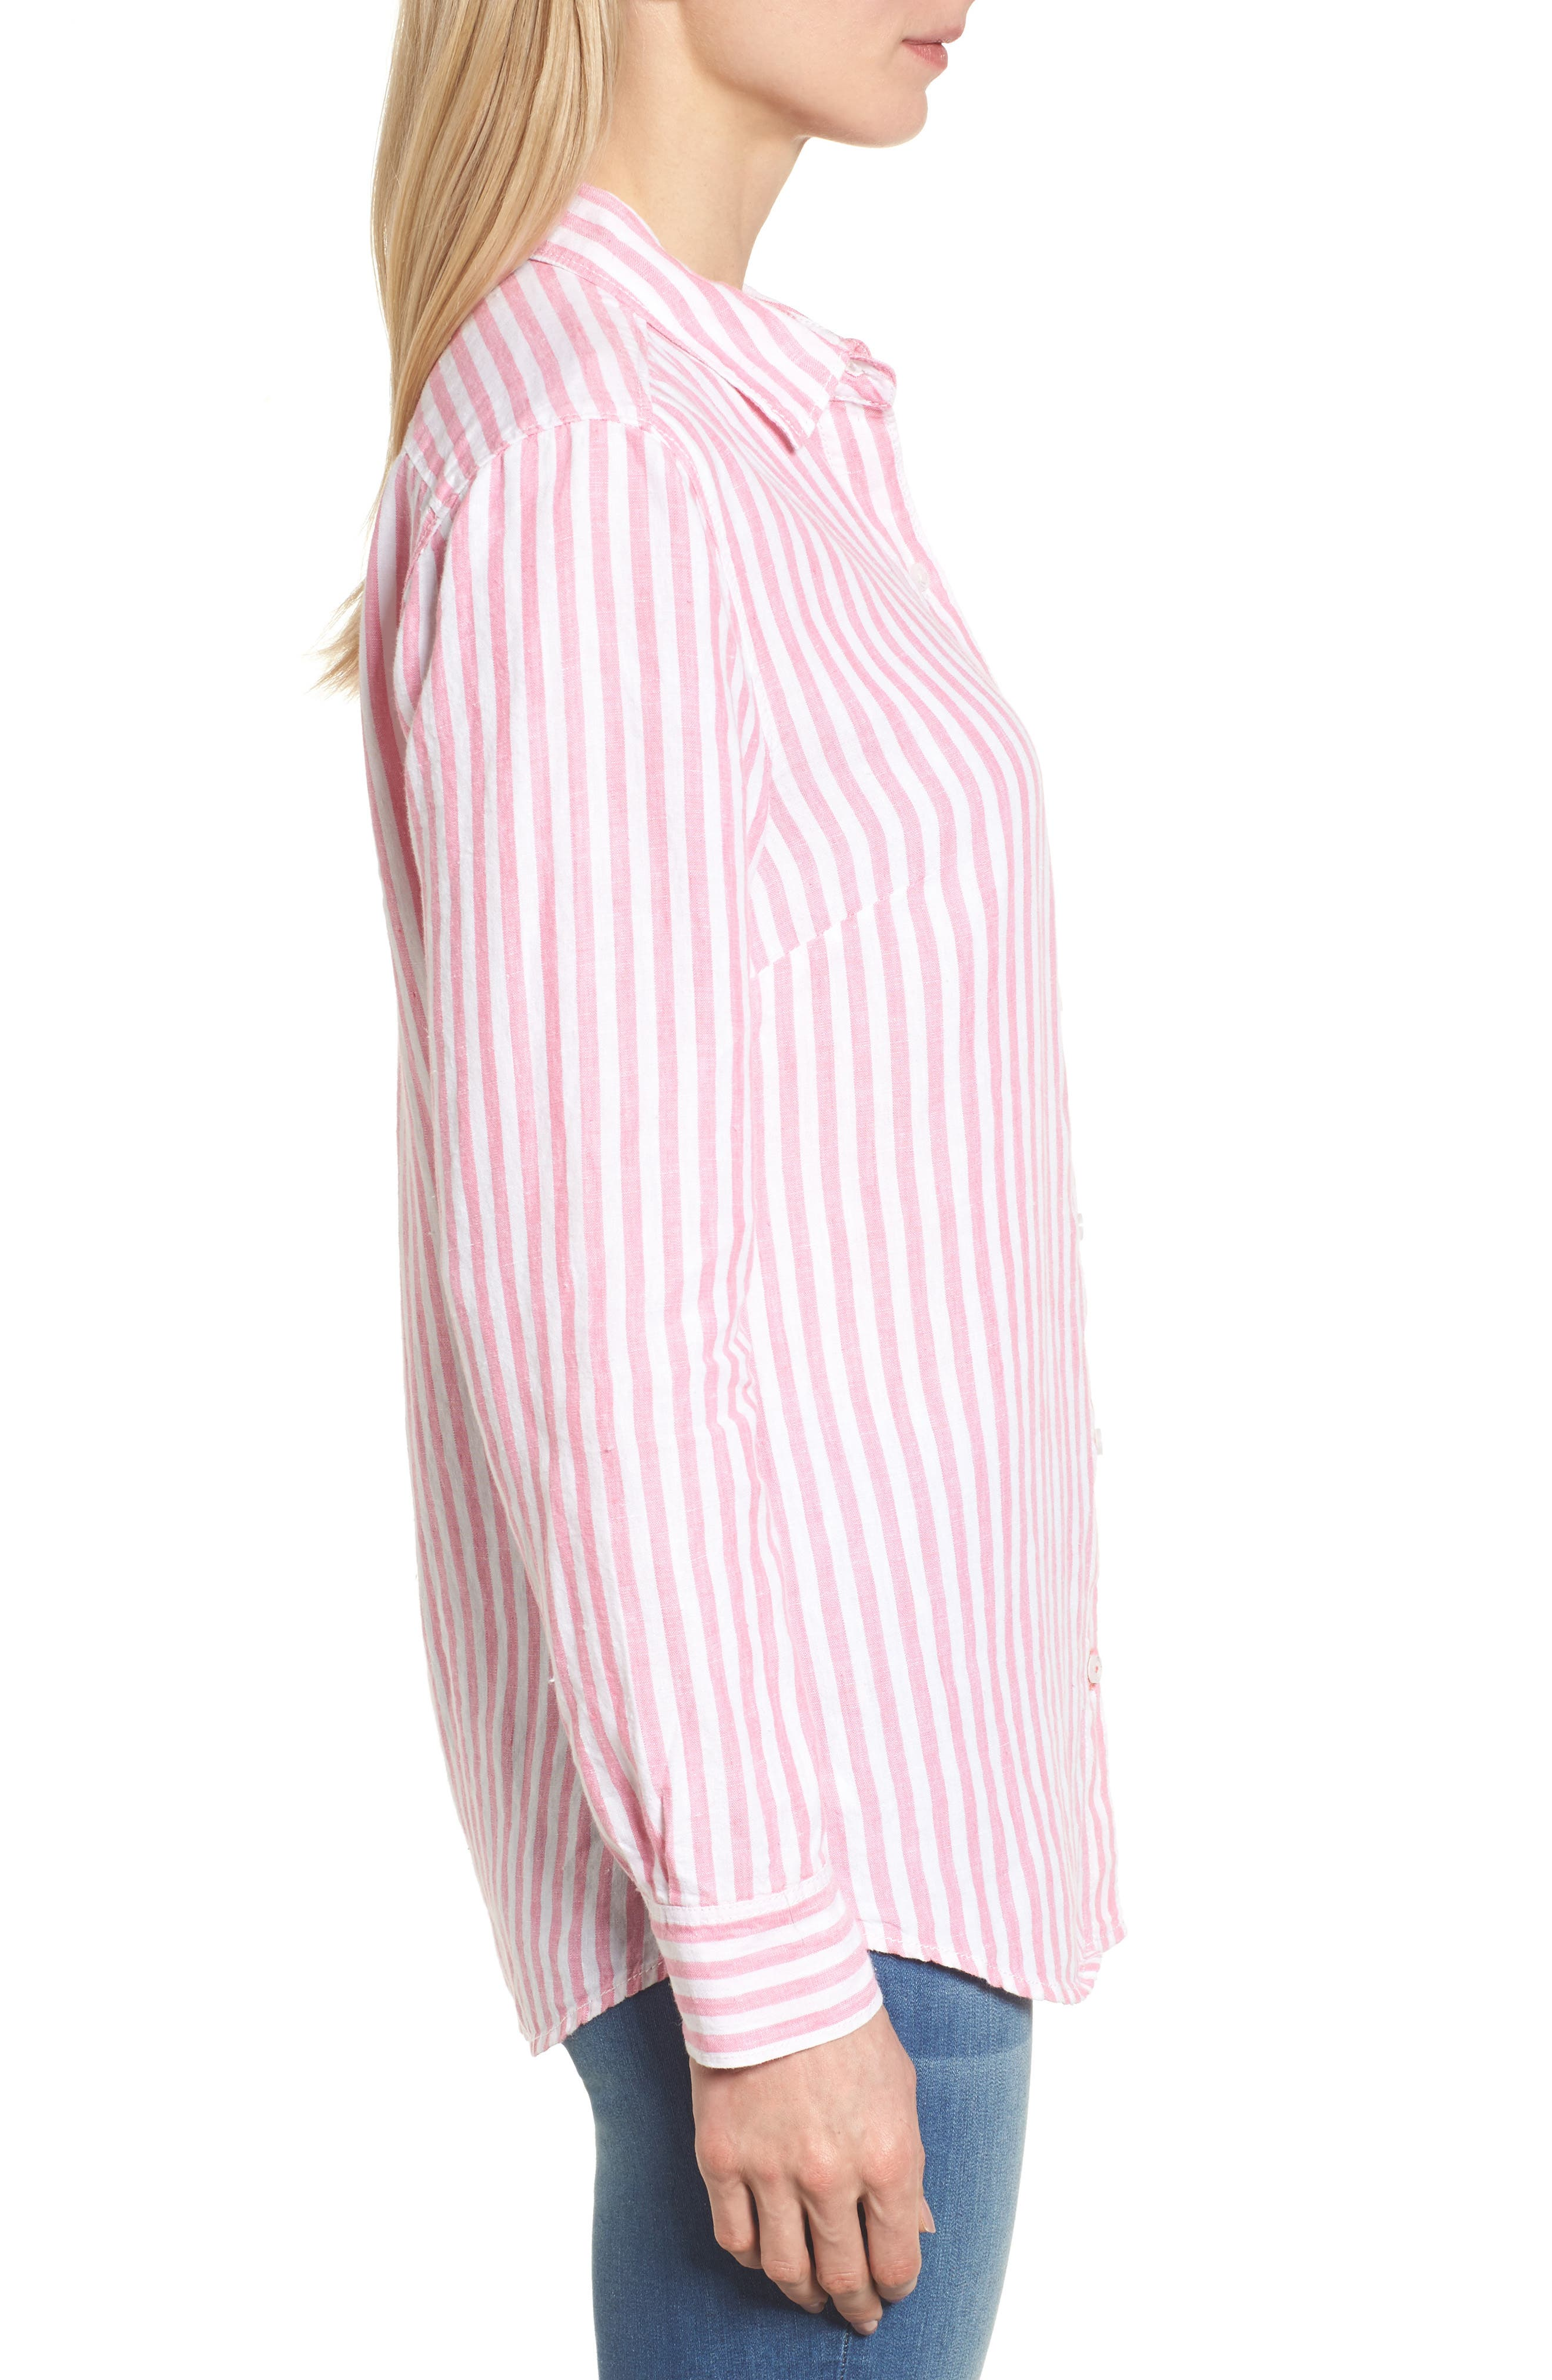 Cabana Stripe Button-Up Top,                             Alternate thumbnail 3, color,                             Soft Flamingo